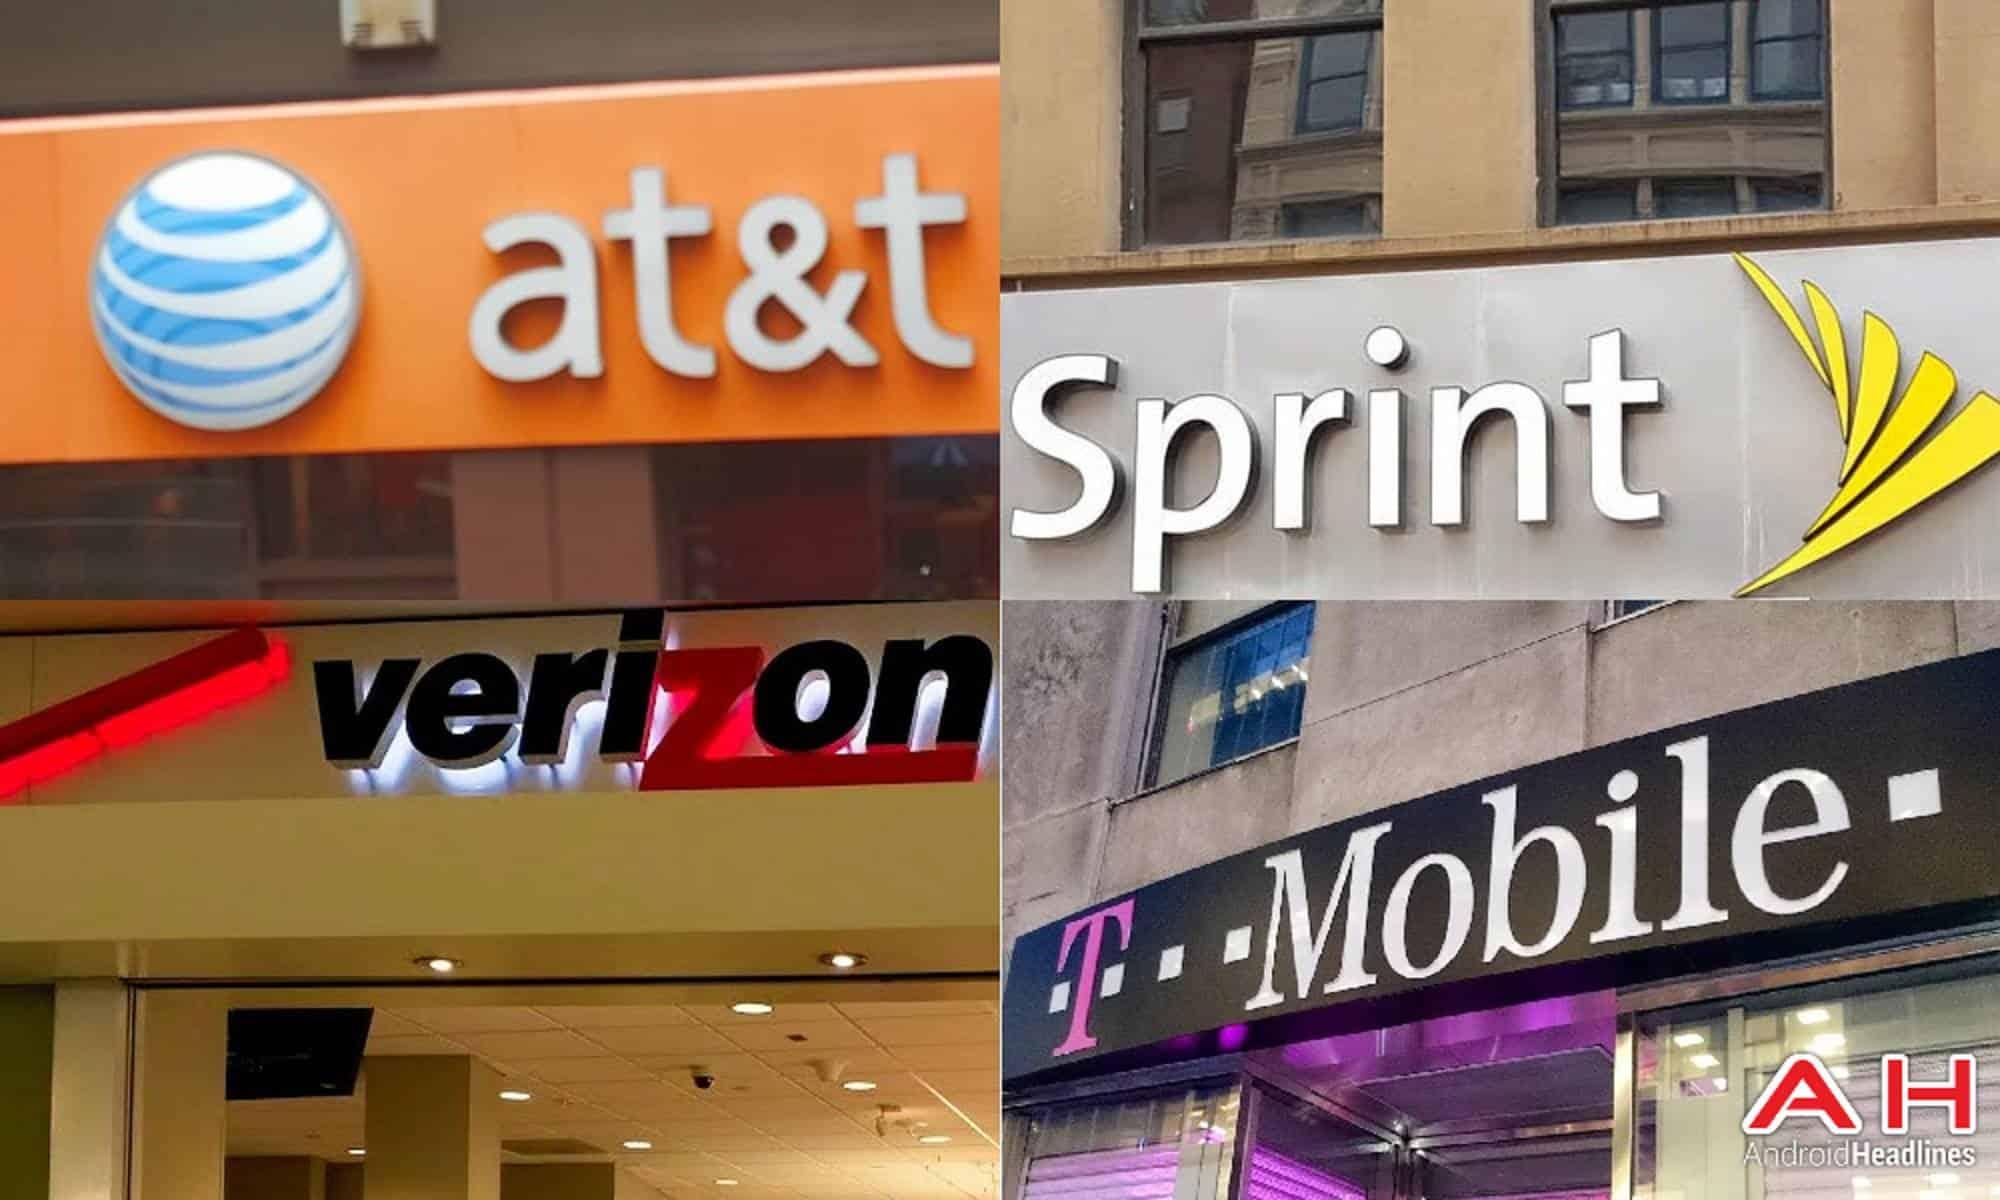 US Carriers T Mobile Verizon Sprint ATT AH